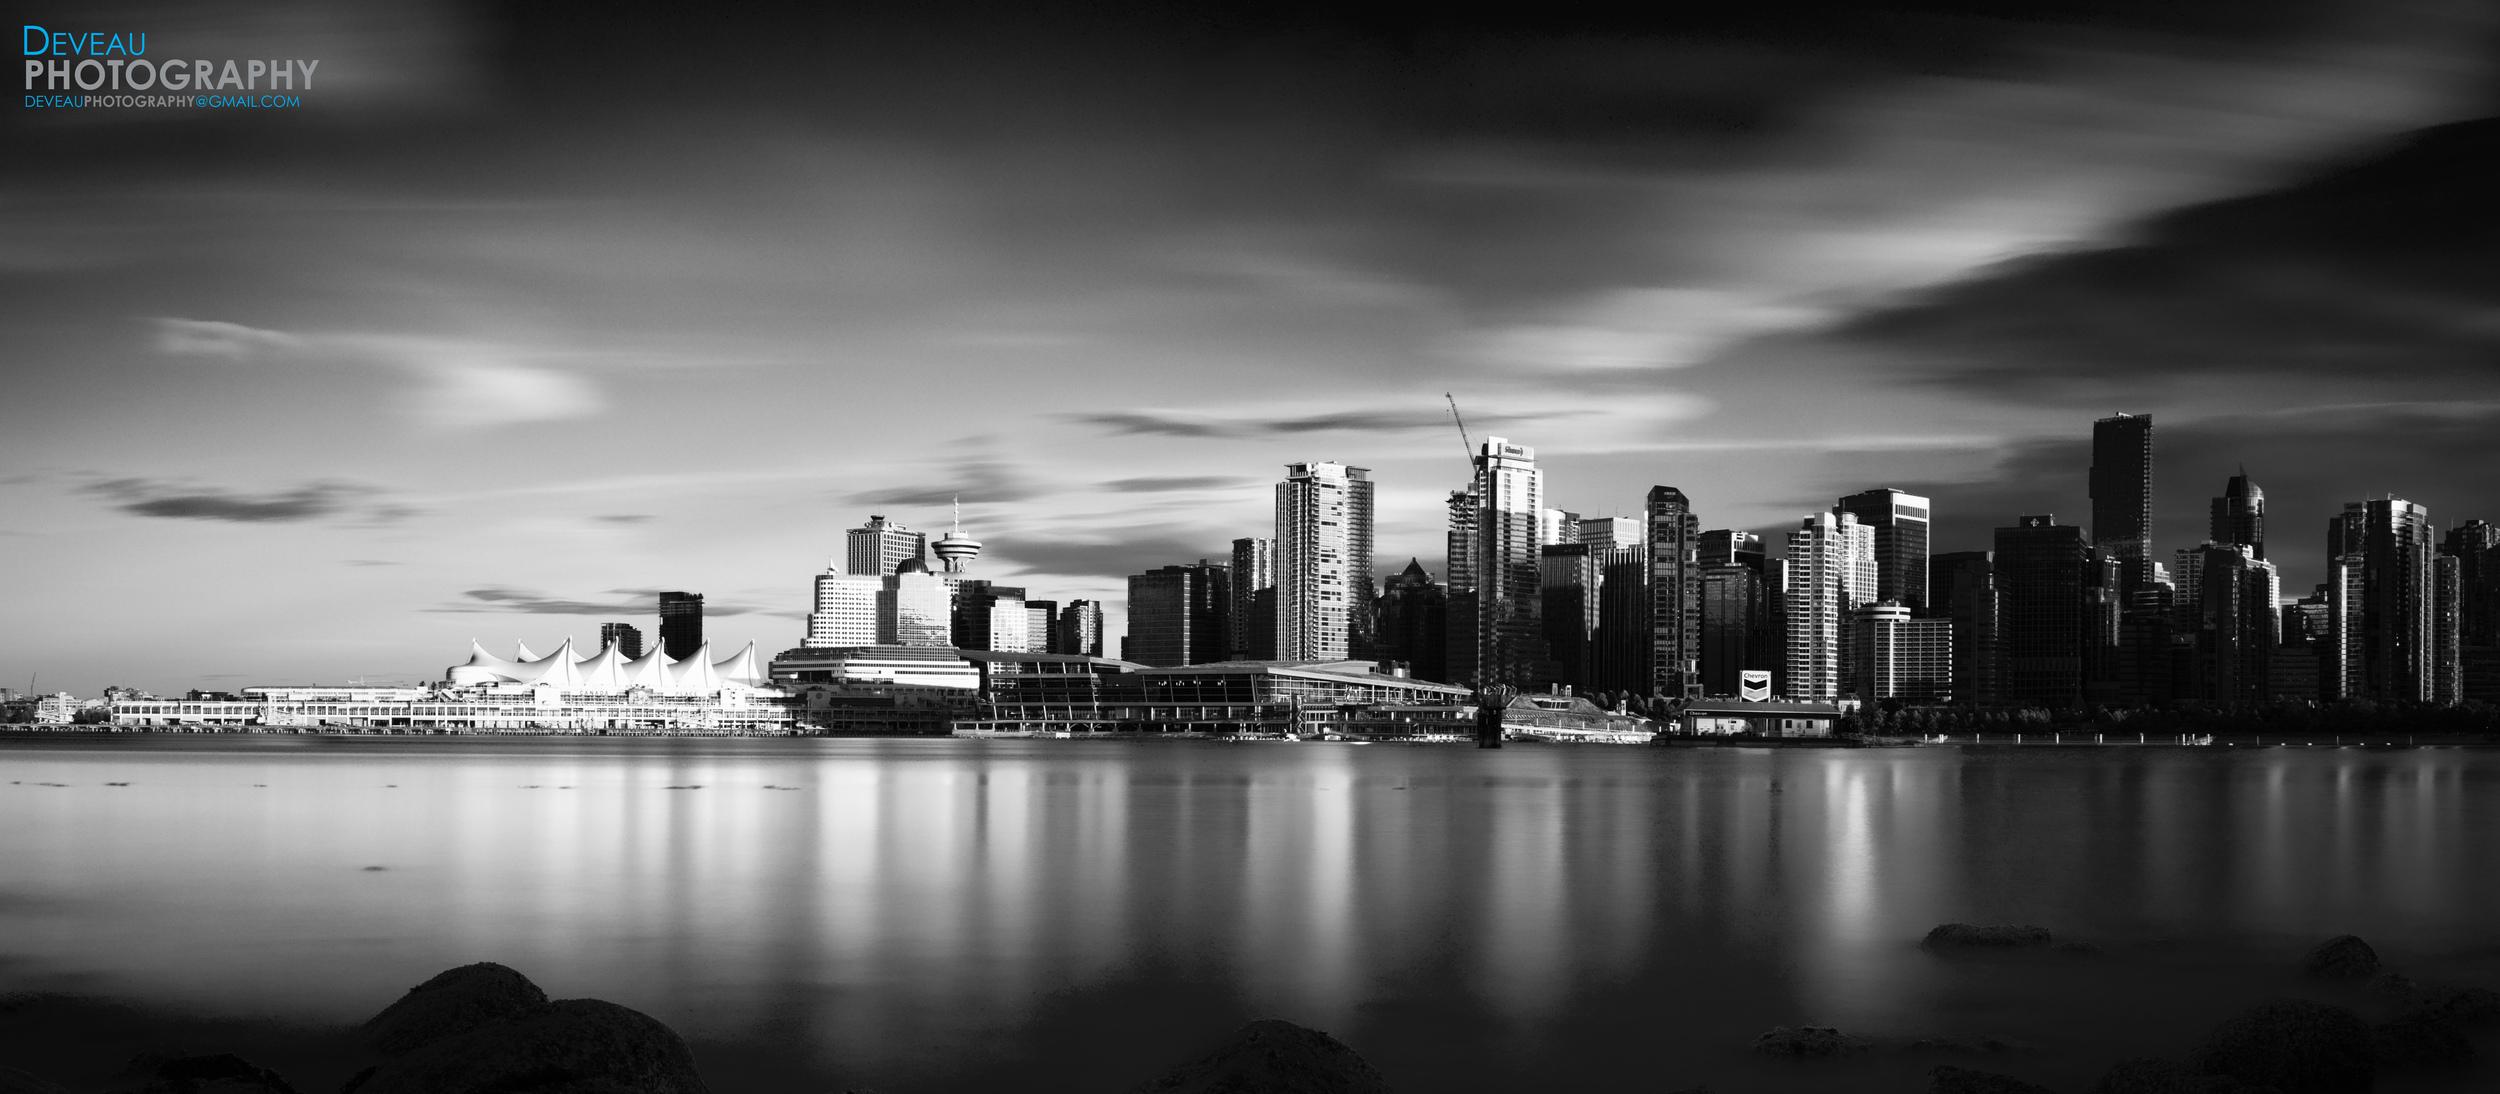 Vancouver in Monochrome